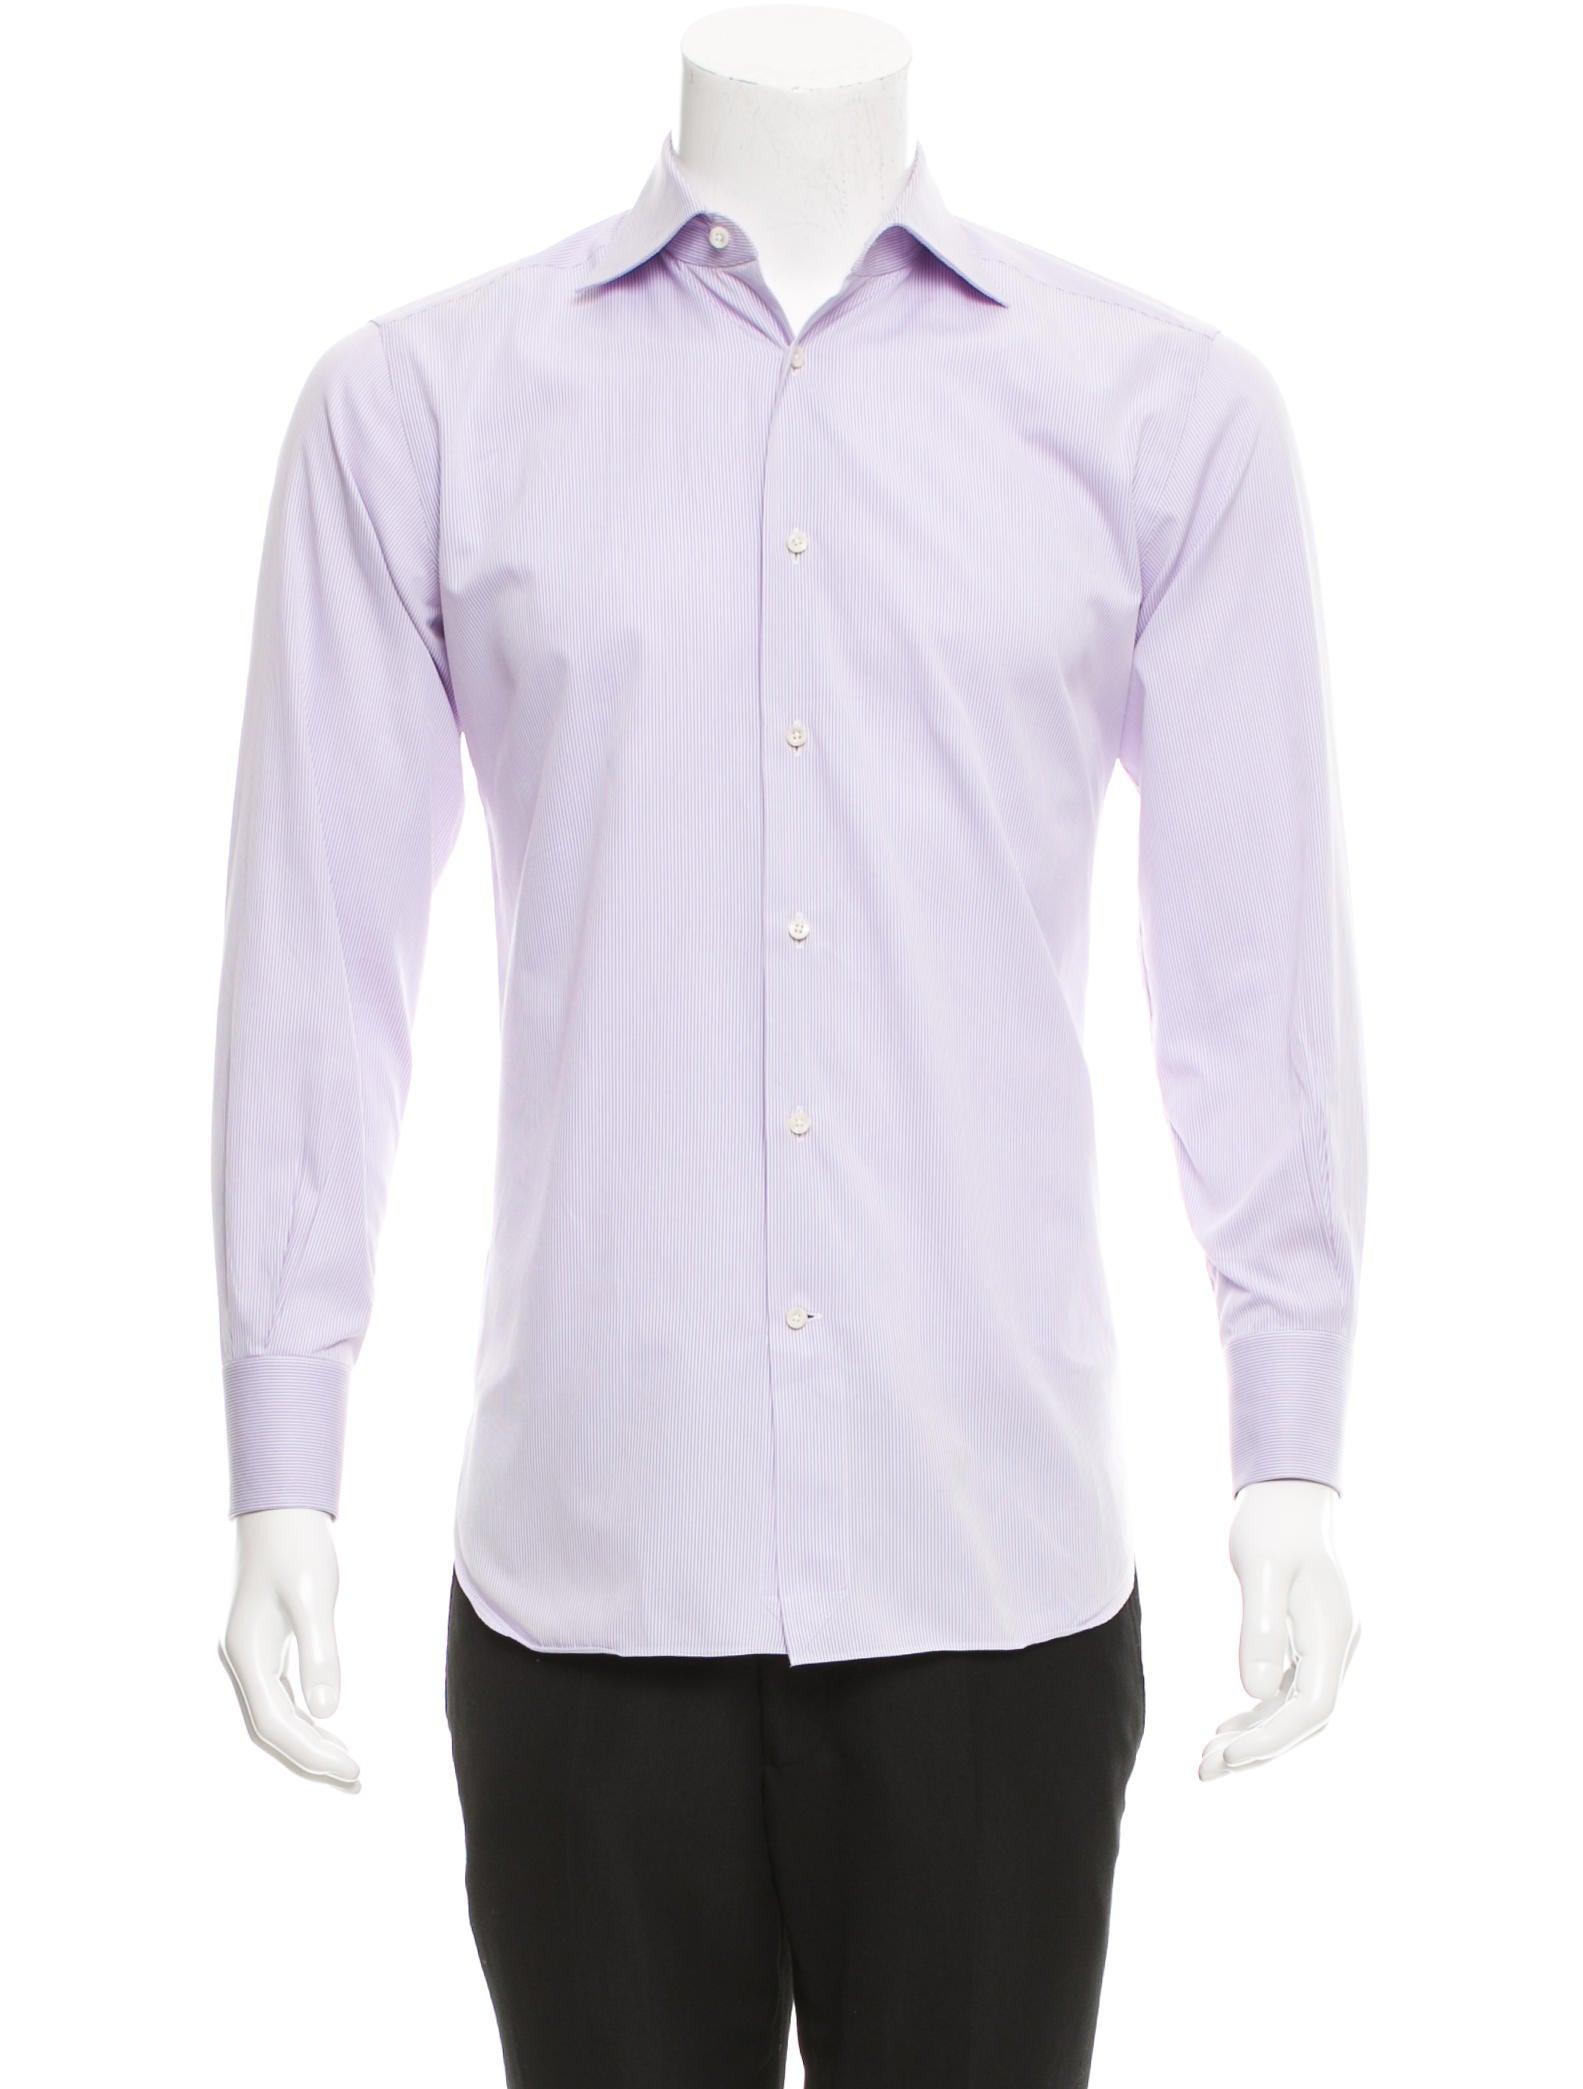 ermenegildo zegna striped button up shirt clothing zgn23961 the realreal. Black Bedroom Furniture Sets. Home Design Ideas